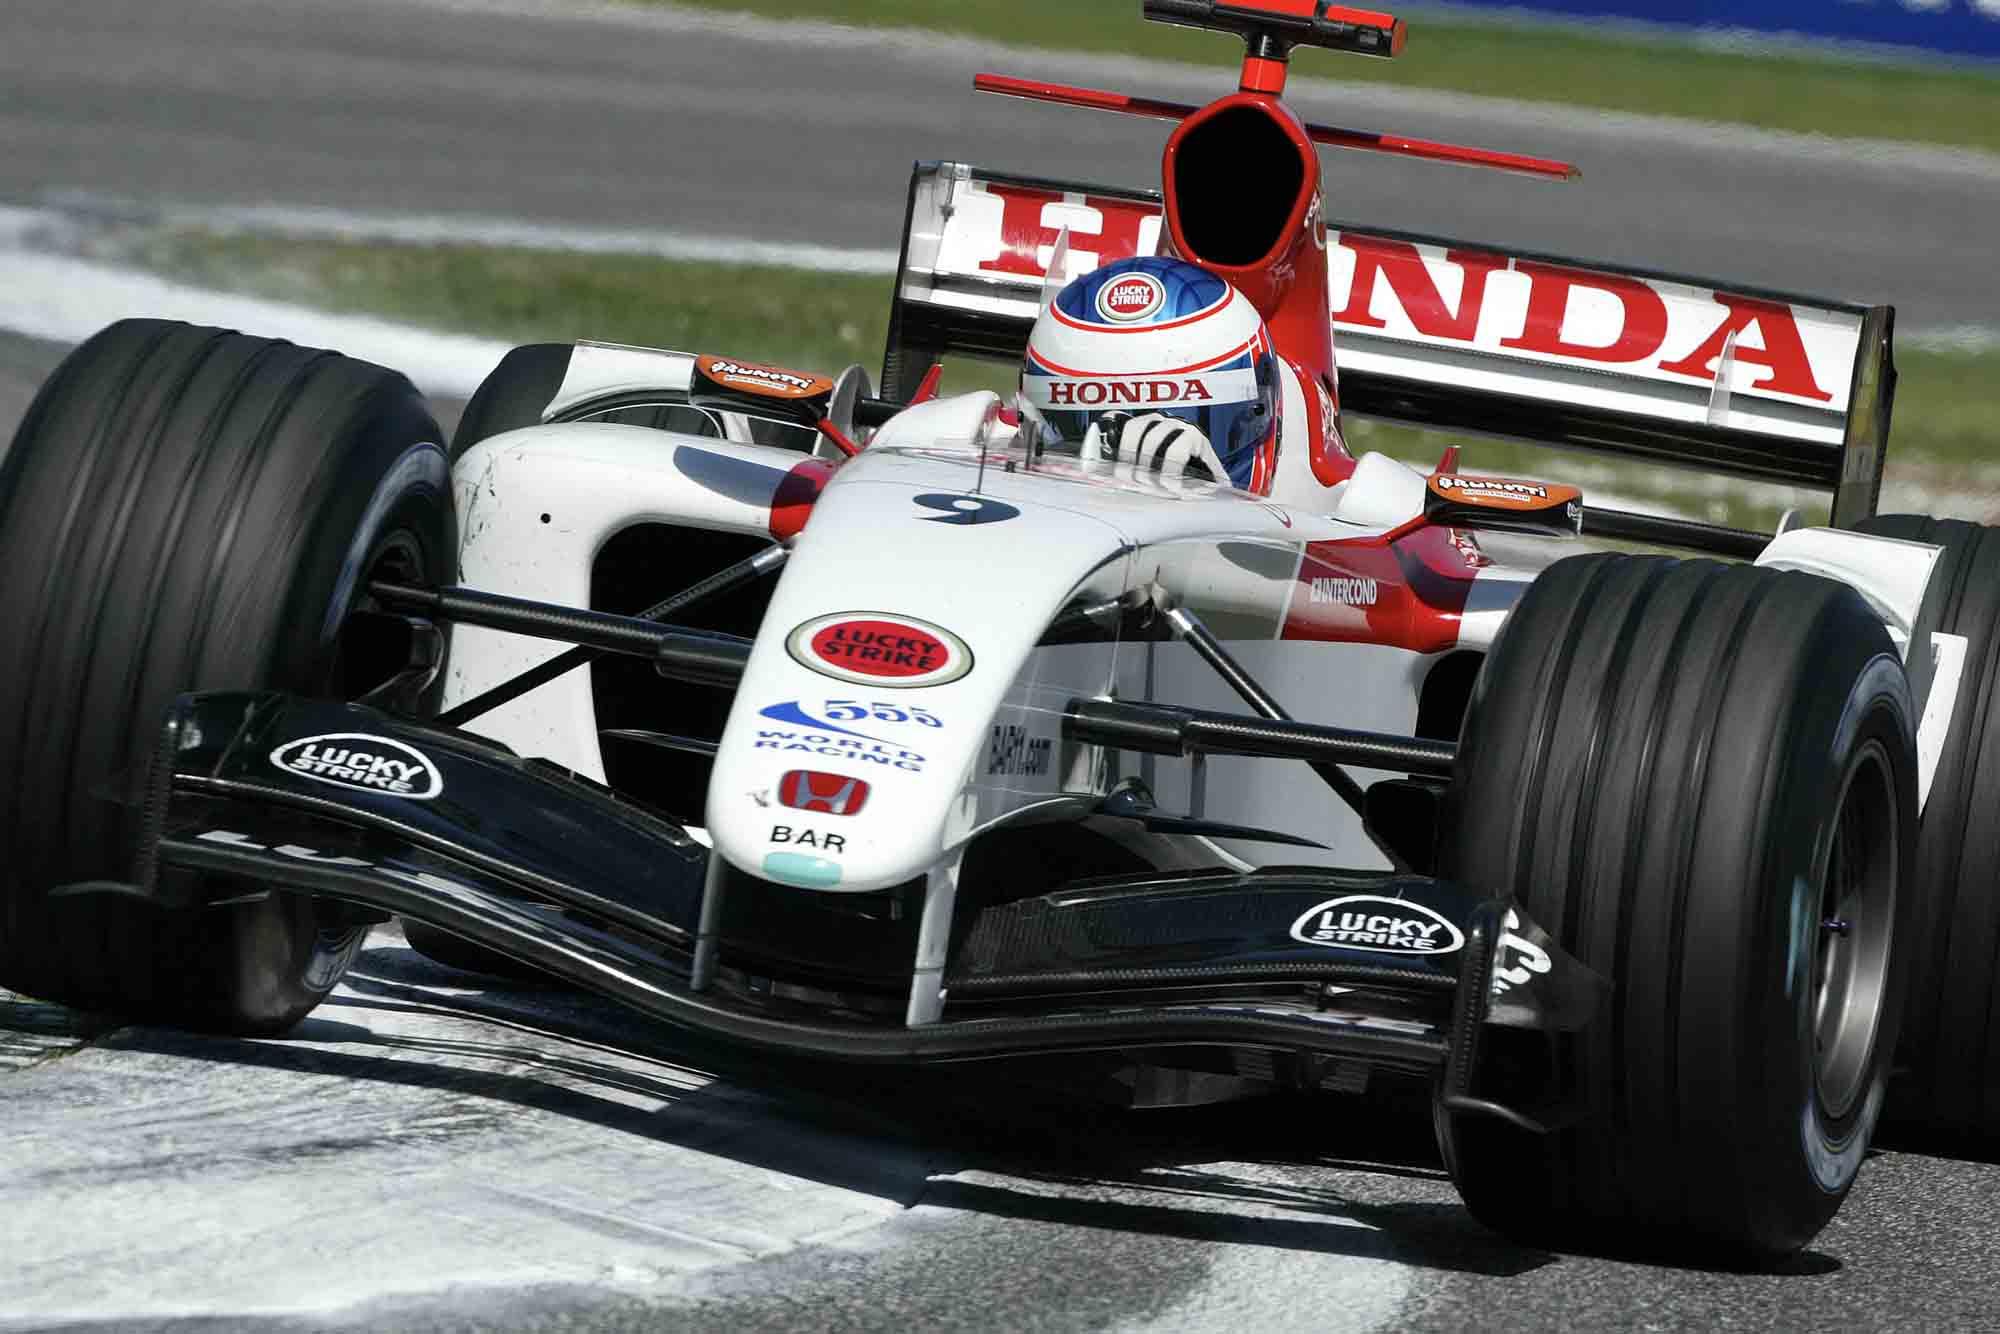 Jenson Button rides the chicane in his BAR-Honda at 2004 San Marino GP